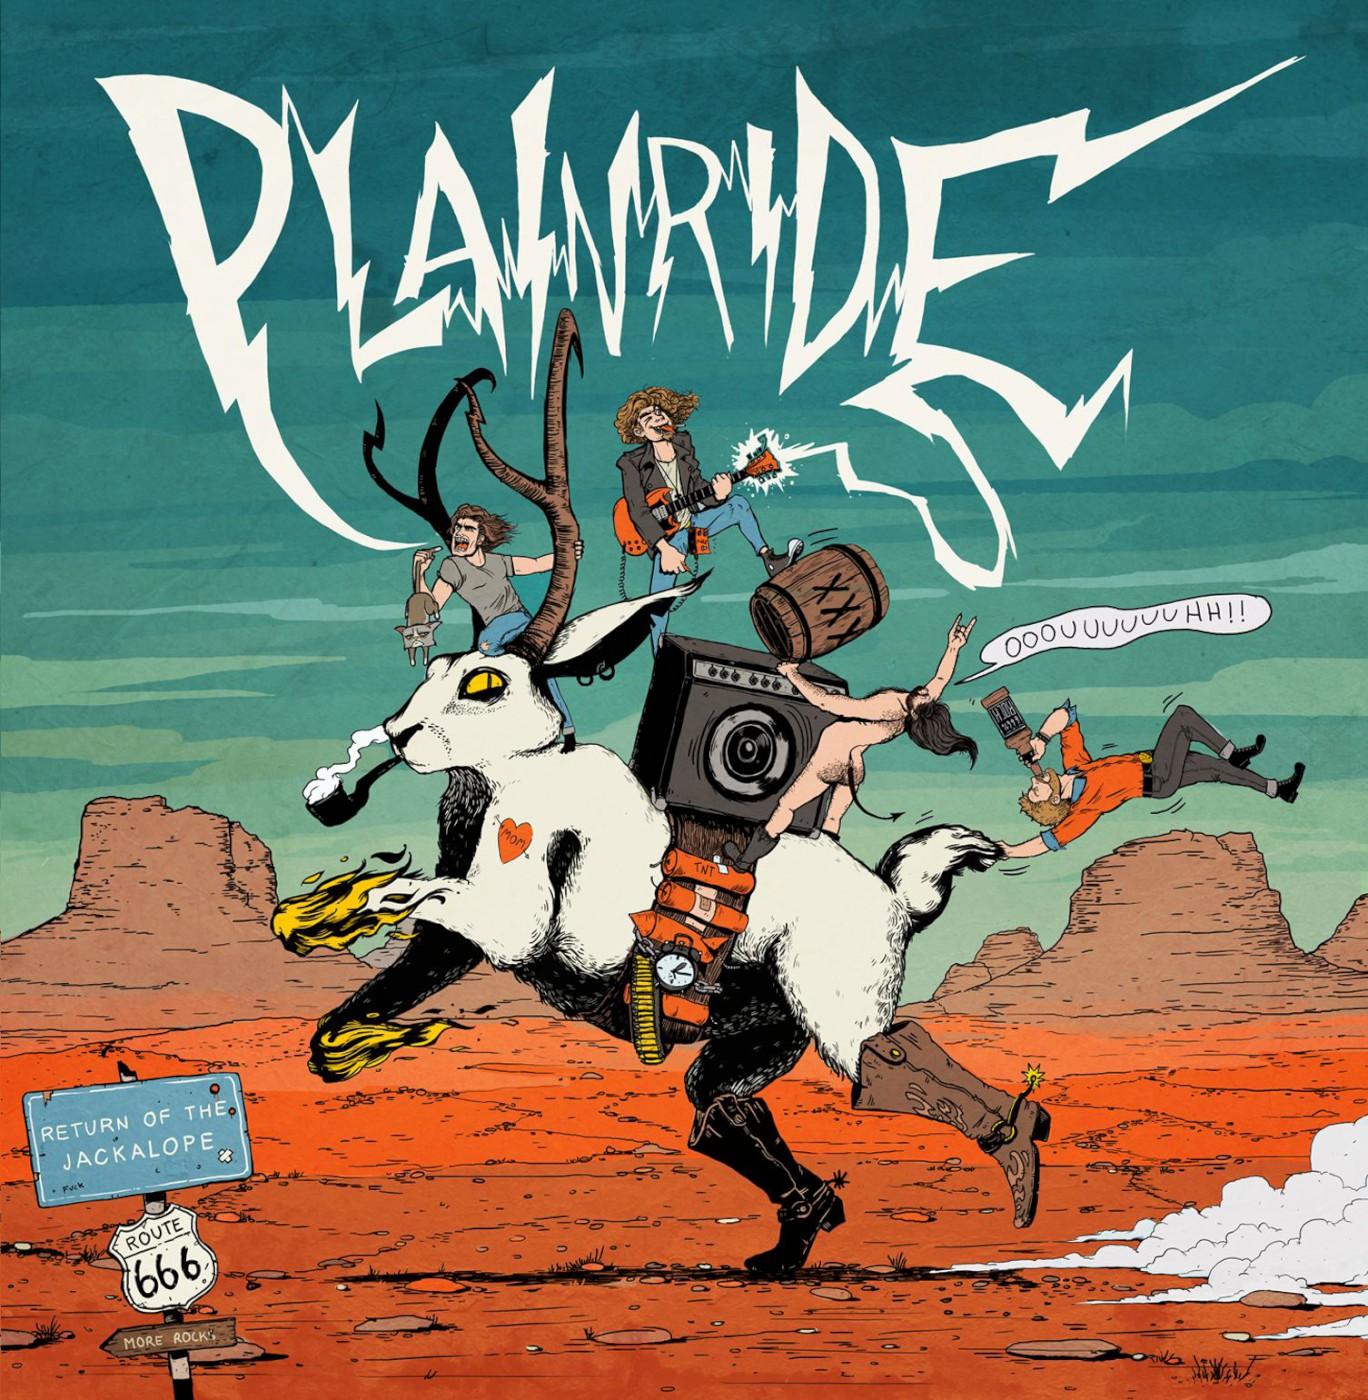 plainride return of the jackalope